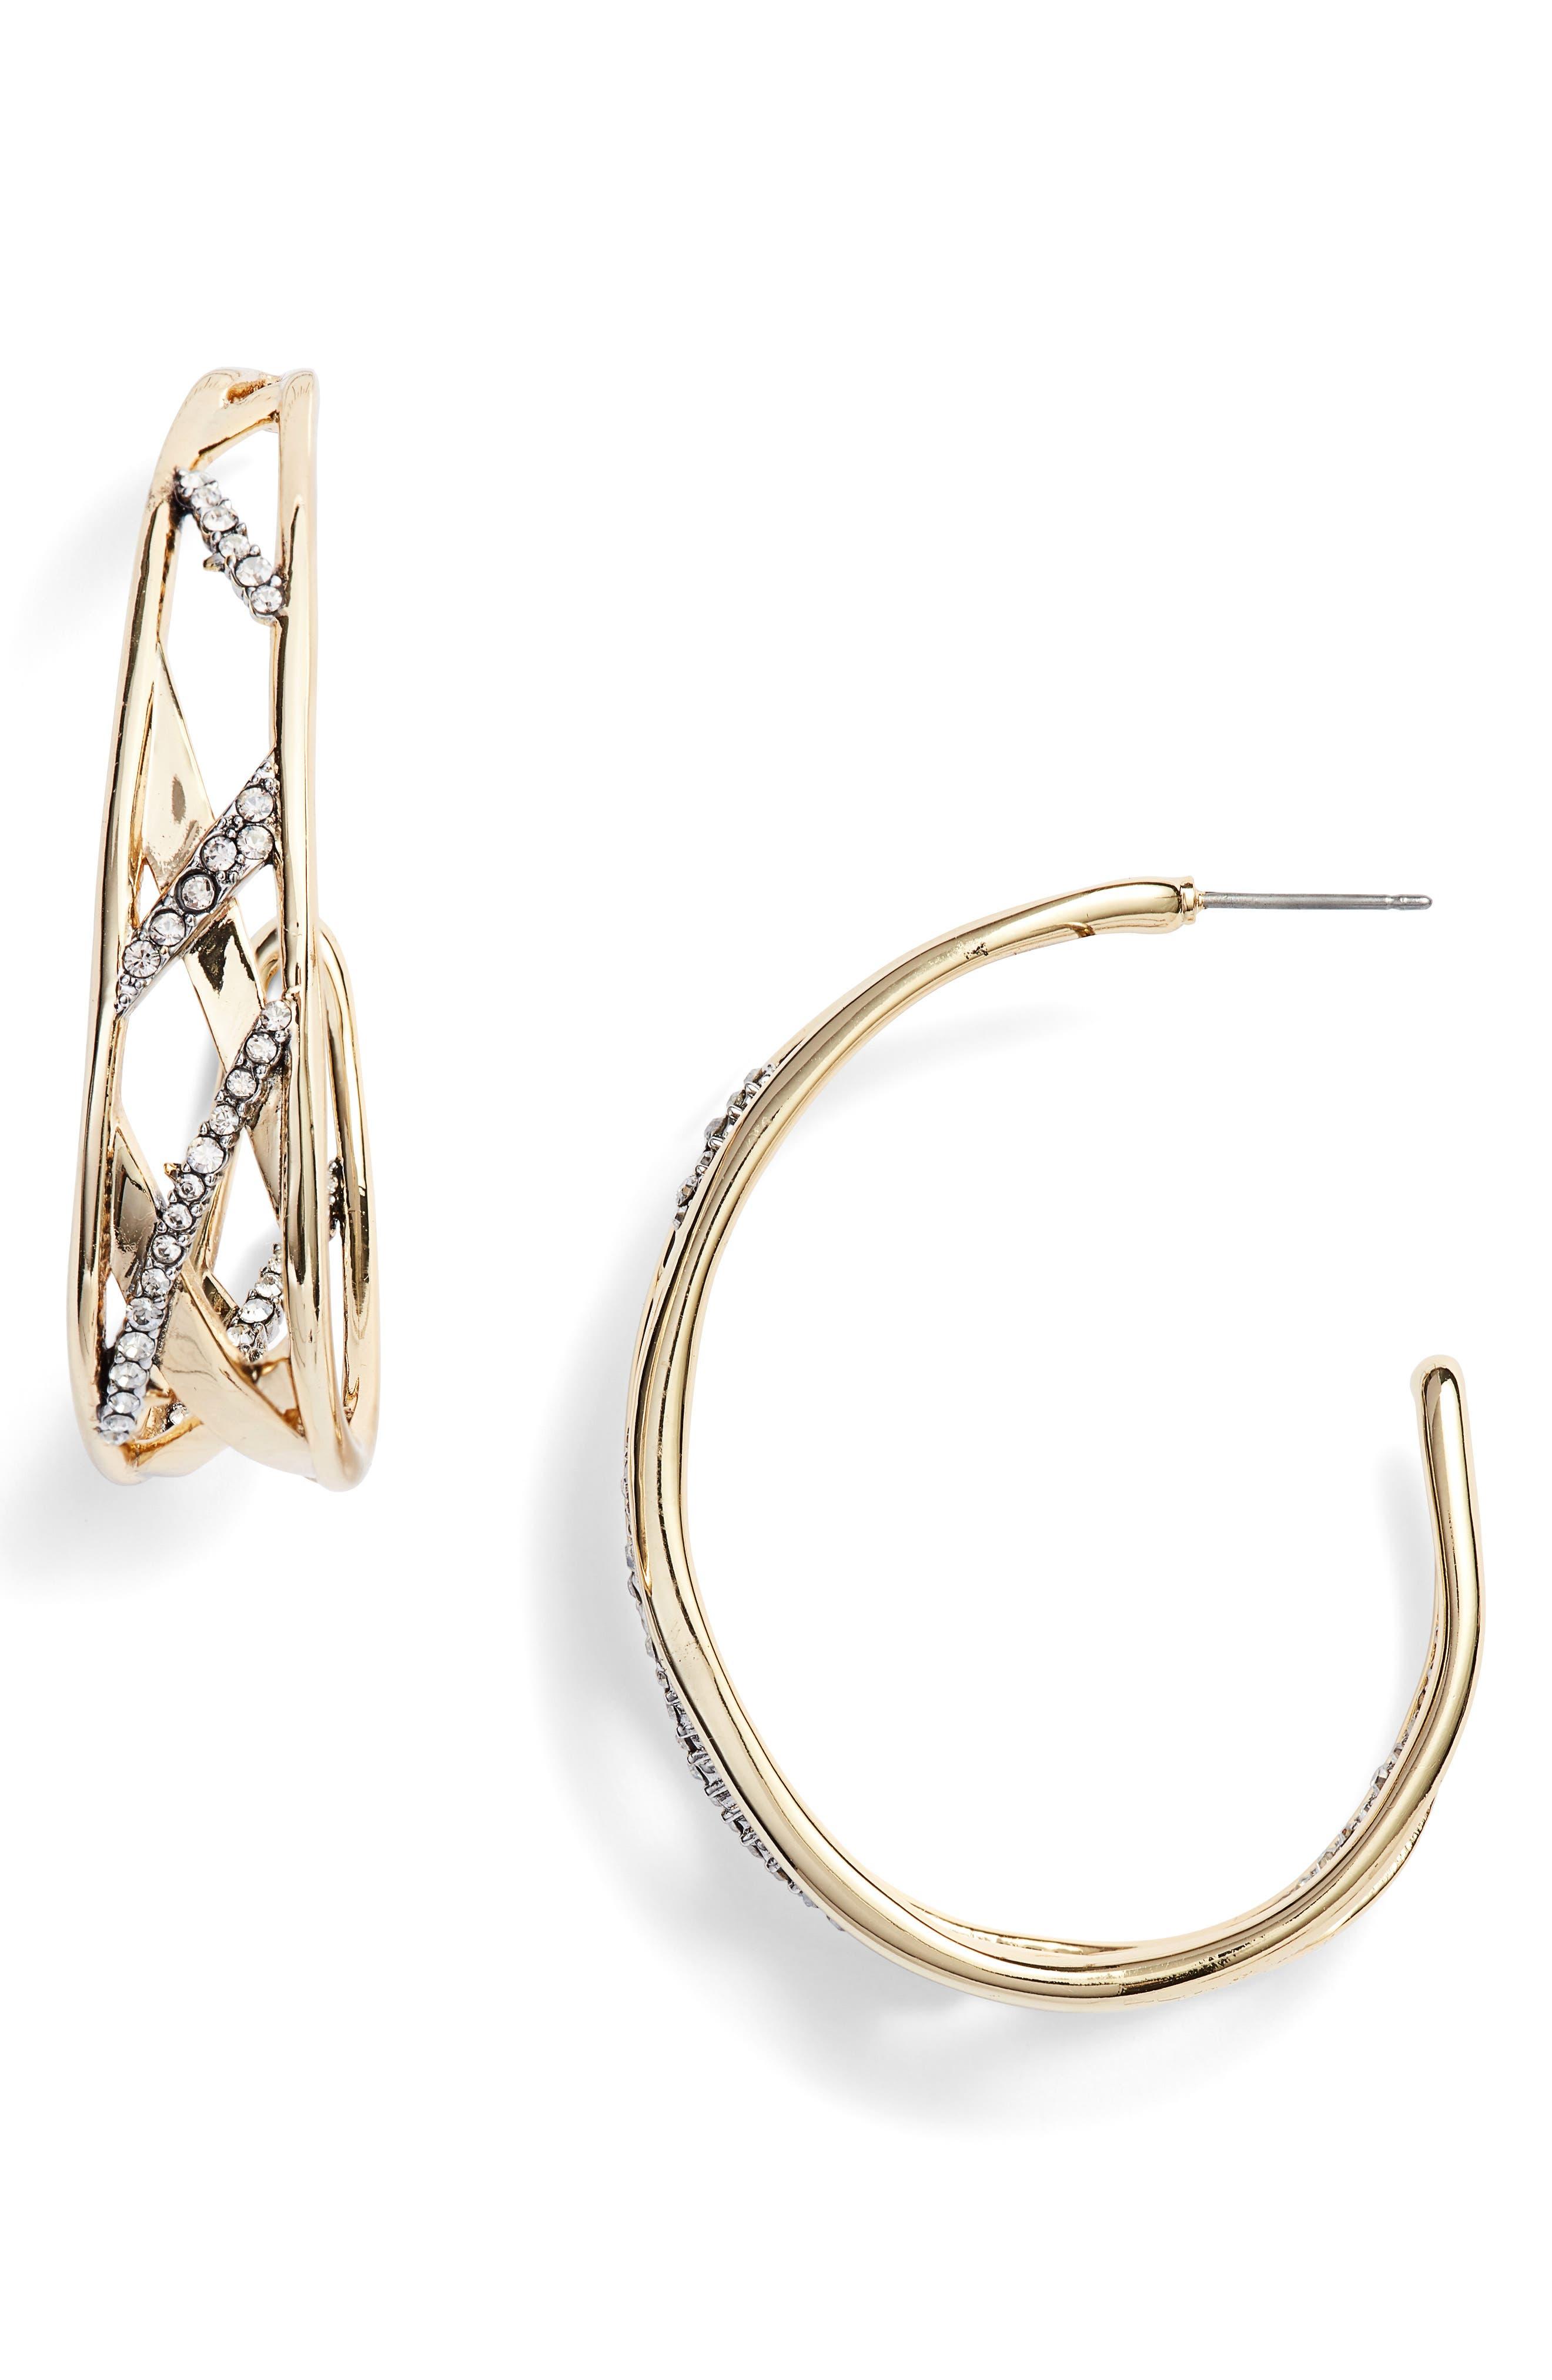 Plaid Hoop Earrings,                         Main,                         color, Gold/ Silver